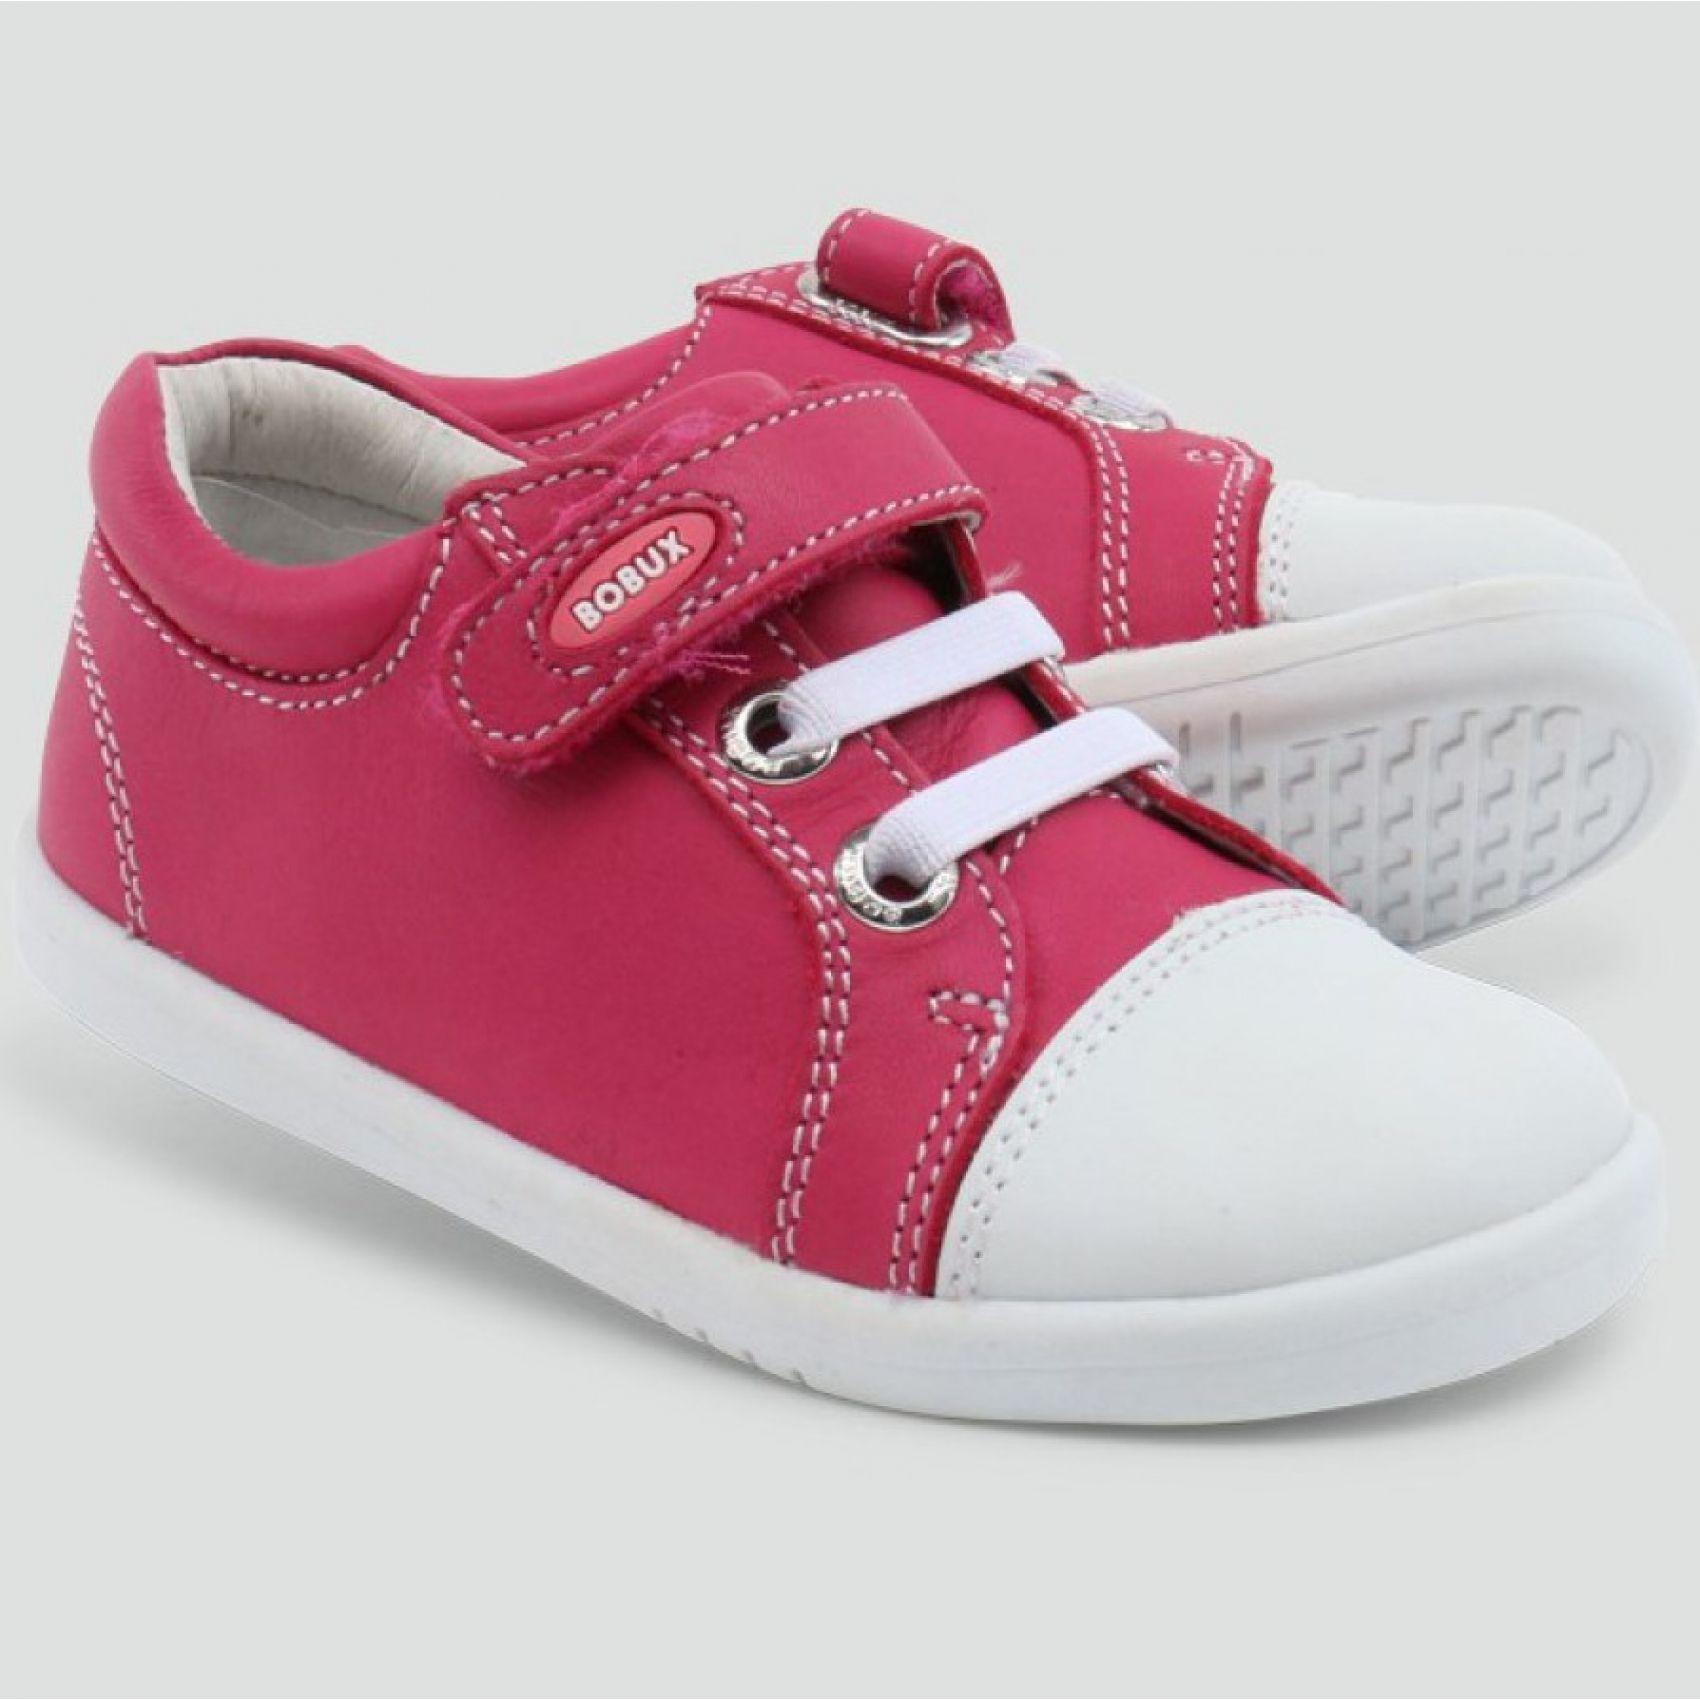 Zlote Polbuty Bobux 627311 Classic Trouble Fuchsia 627311 Polbuty Buty Dla Chlopca Baby Shoes Wedge Sneaker Shoes